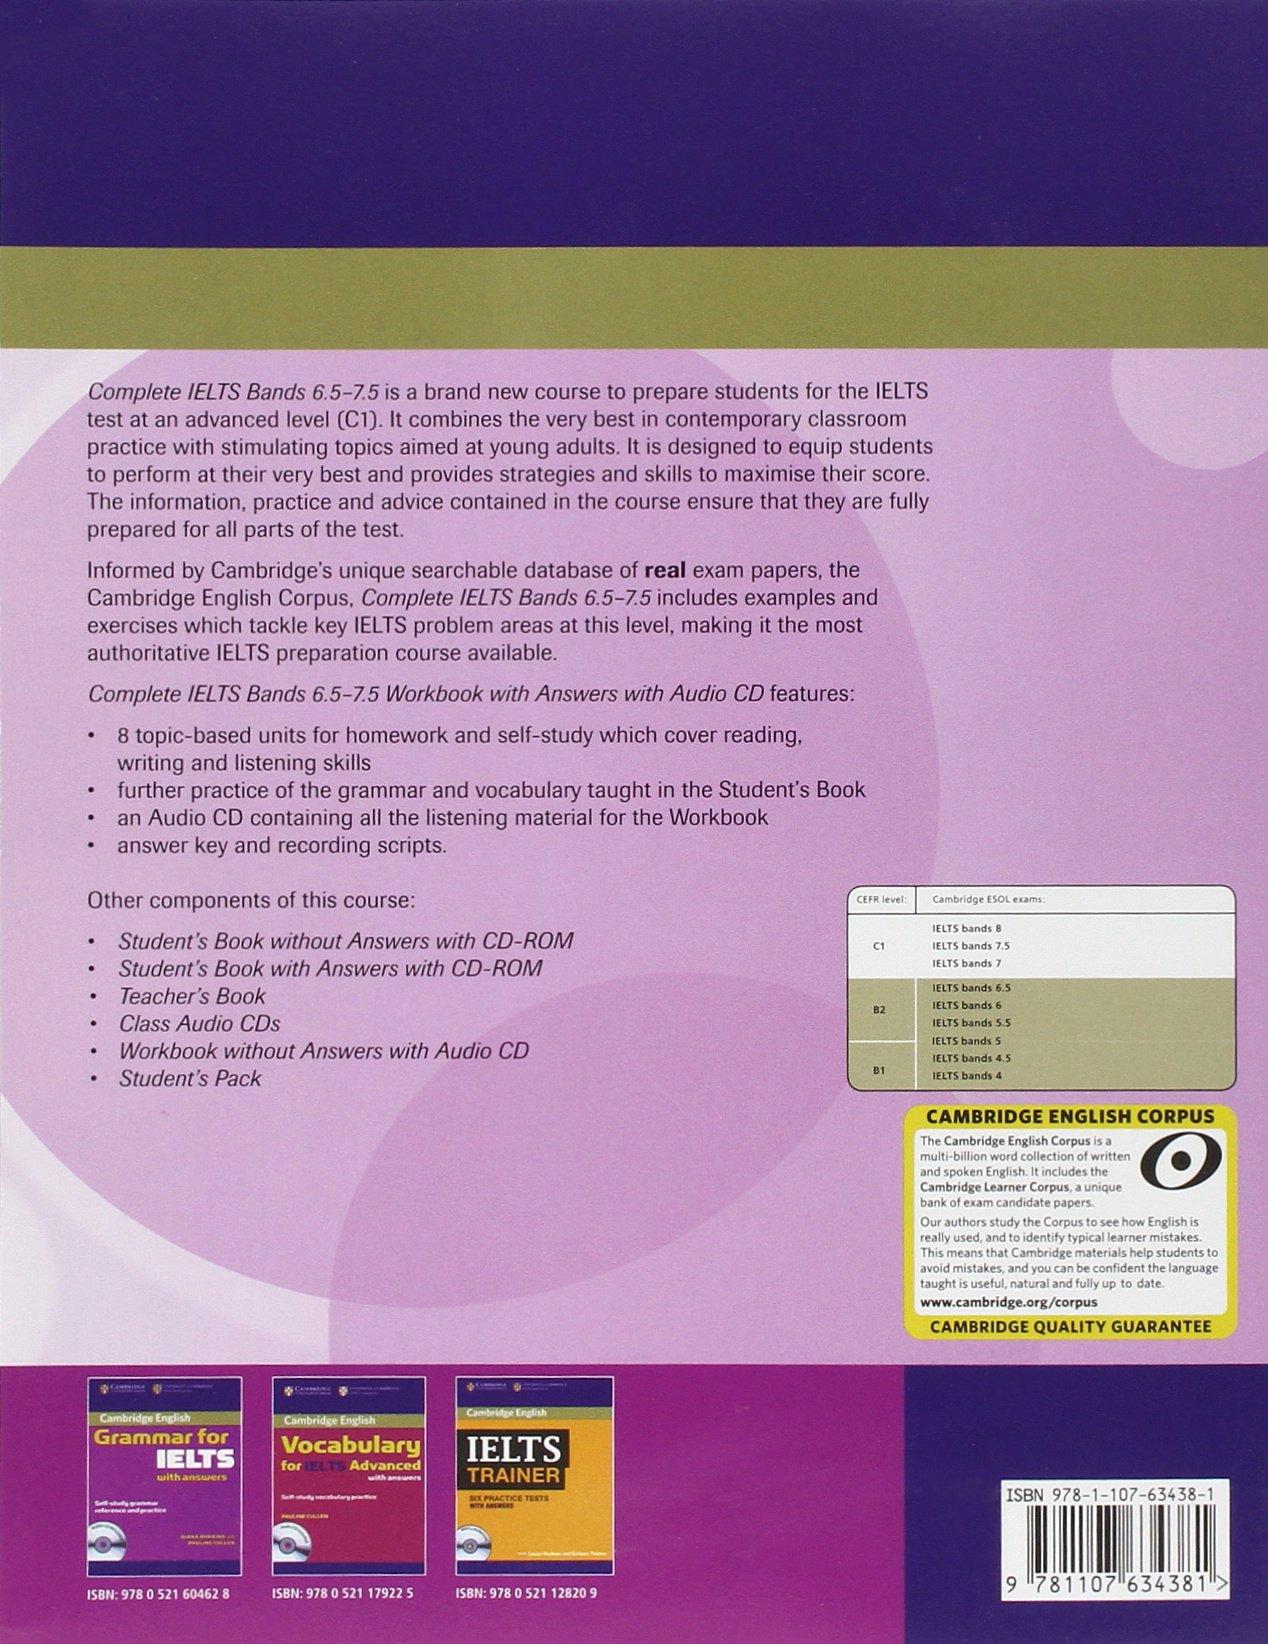 Complete ielts bands 65 75 workbook with answers with audio cd complete ielts bands 65 75 workbook with answers with audio cd cambridge english amazon rawdon wyatt fremdsprachige bcher fandeluxe Images